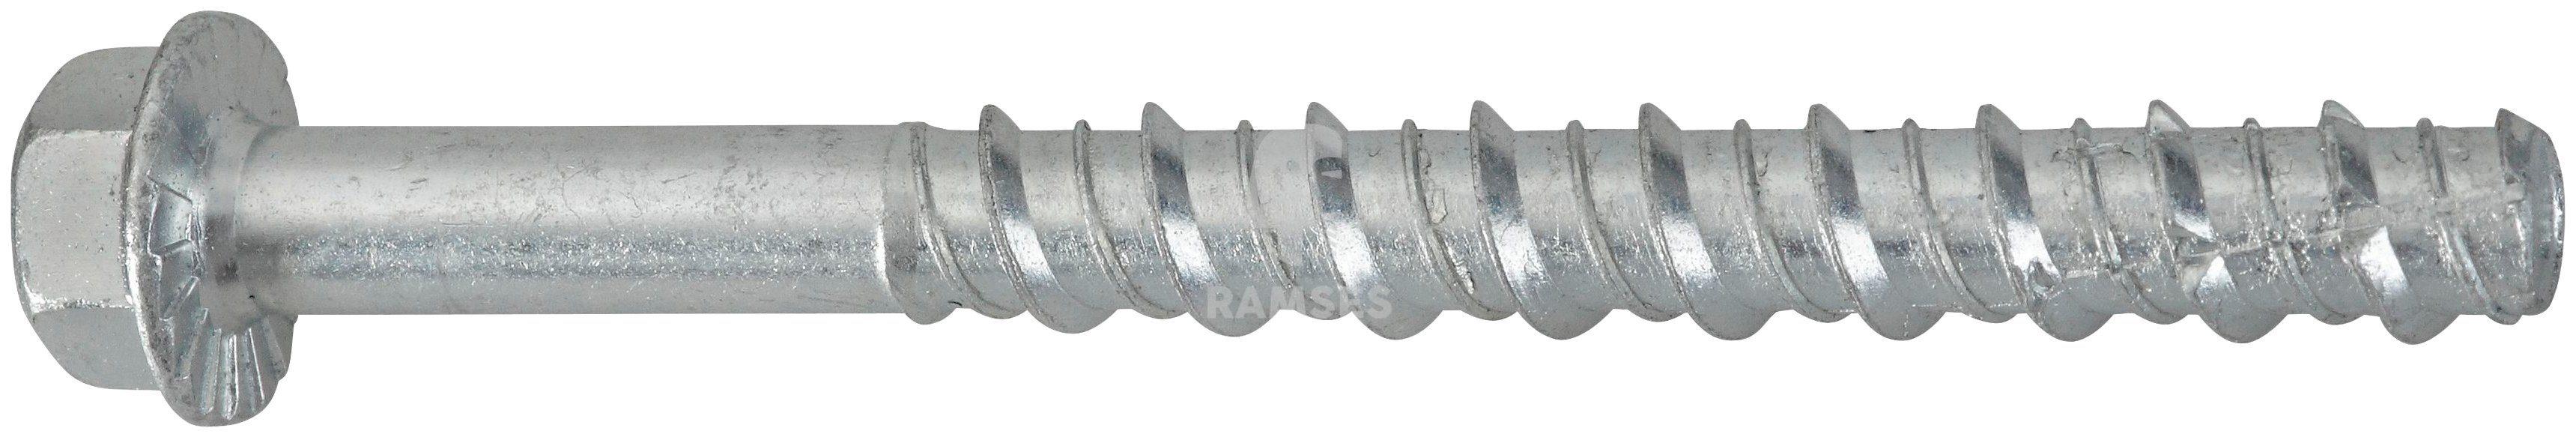 RAMSES Schrauben , Betonschraube 10 x 140 mm25 Stk.